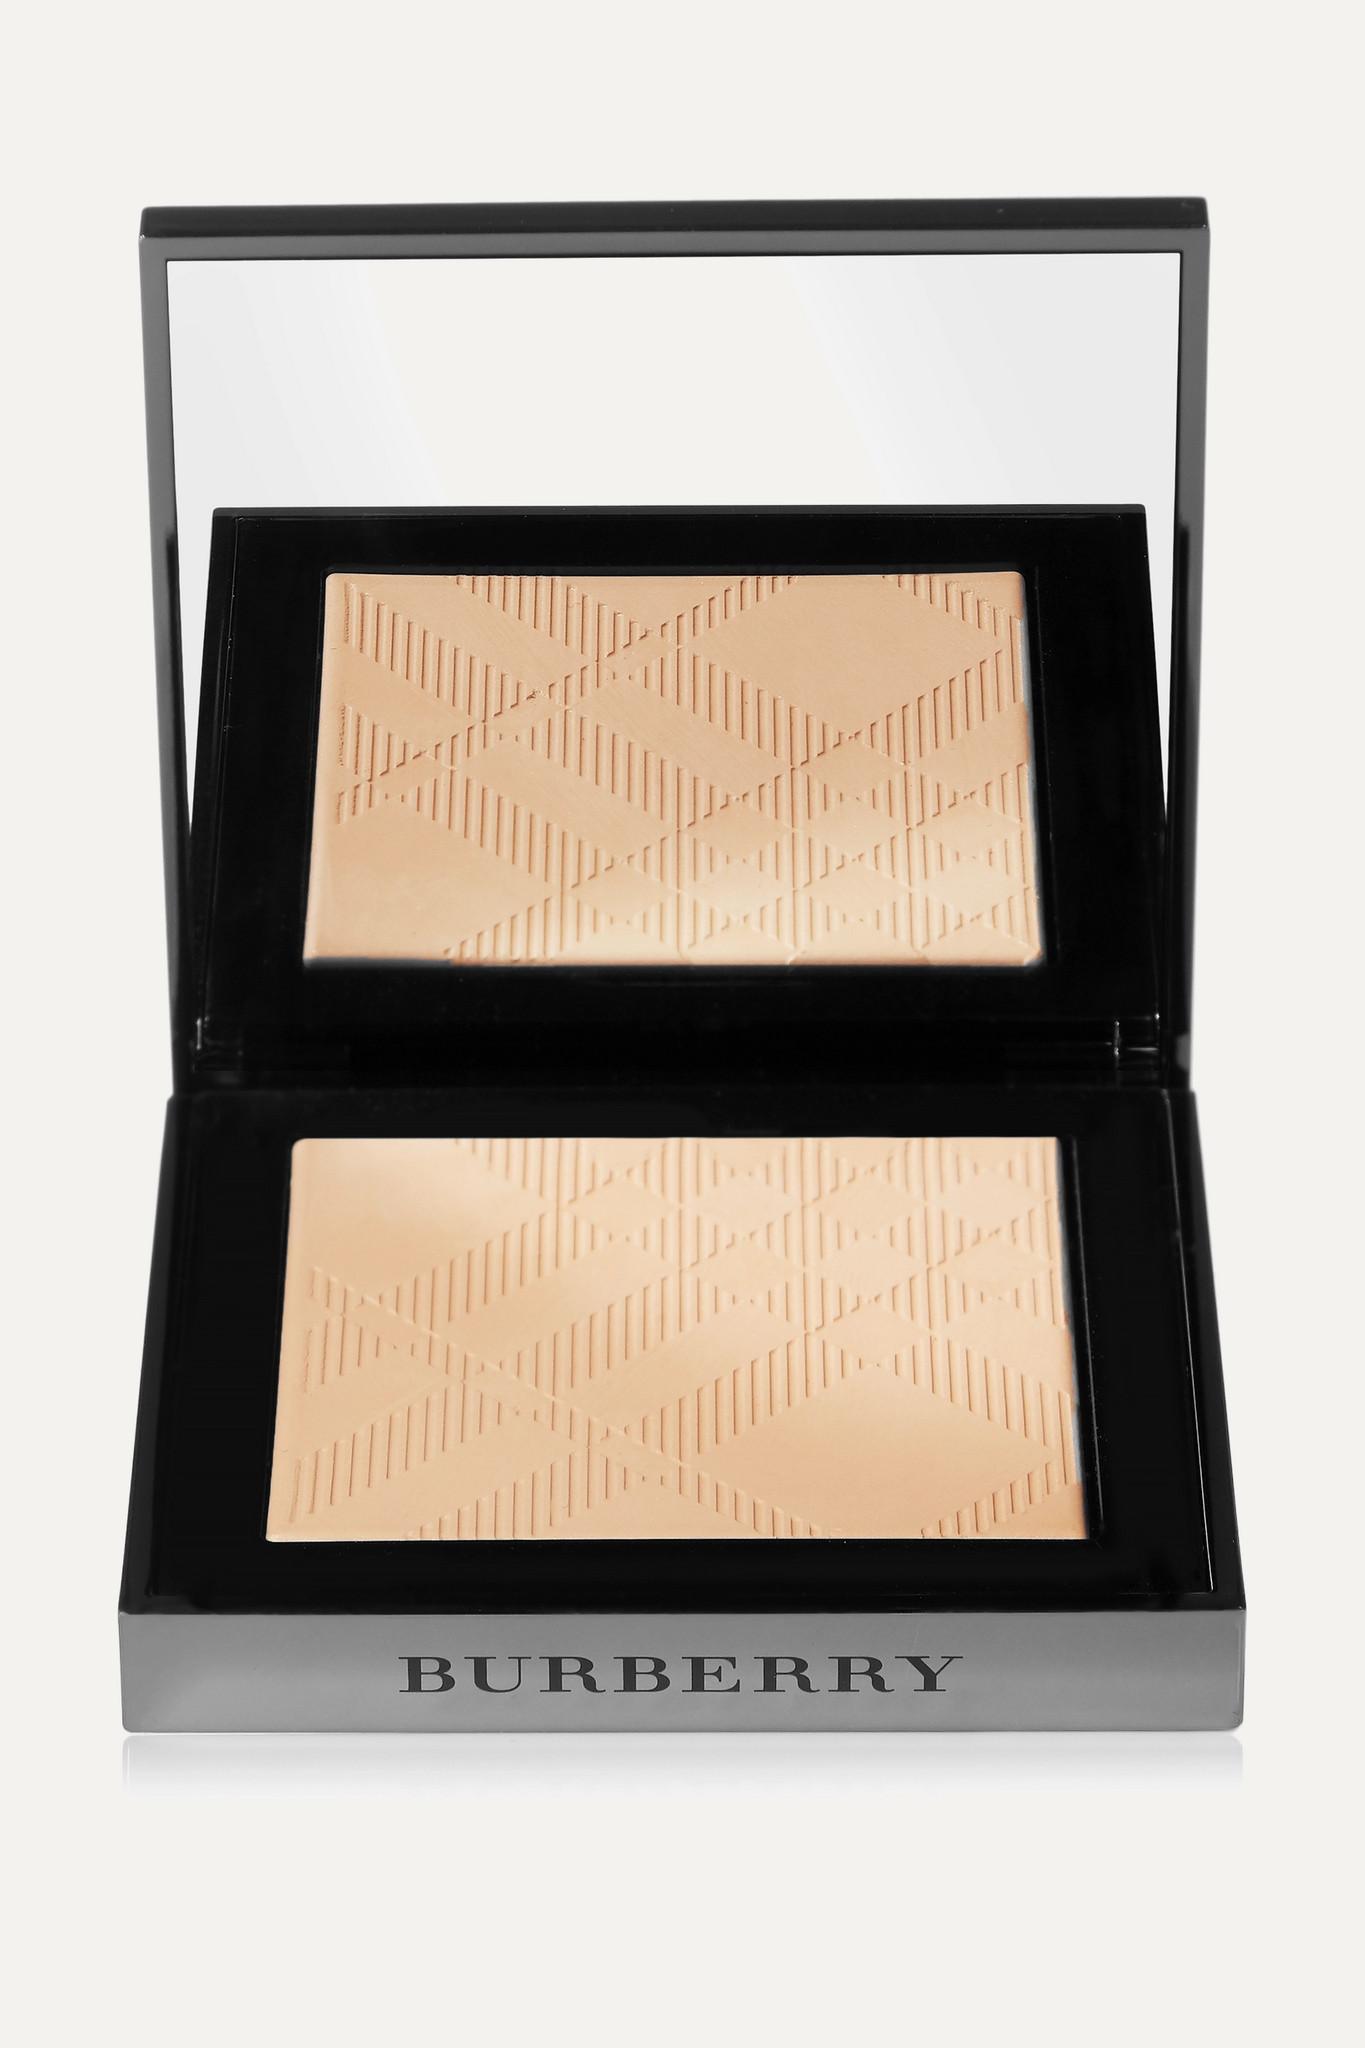 BURBERRY BEAUTY - 裸肌亮彩粉饼(色号:ochre Nude No.12) - 中性色 - one size